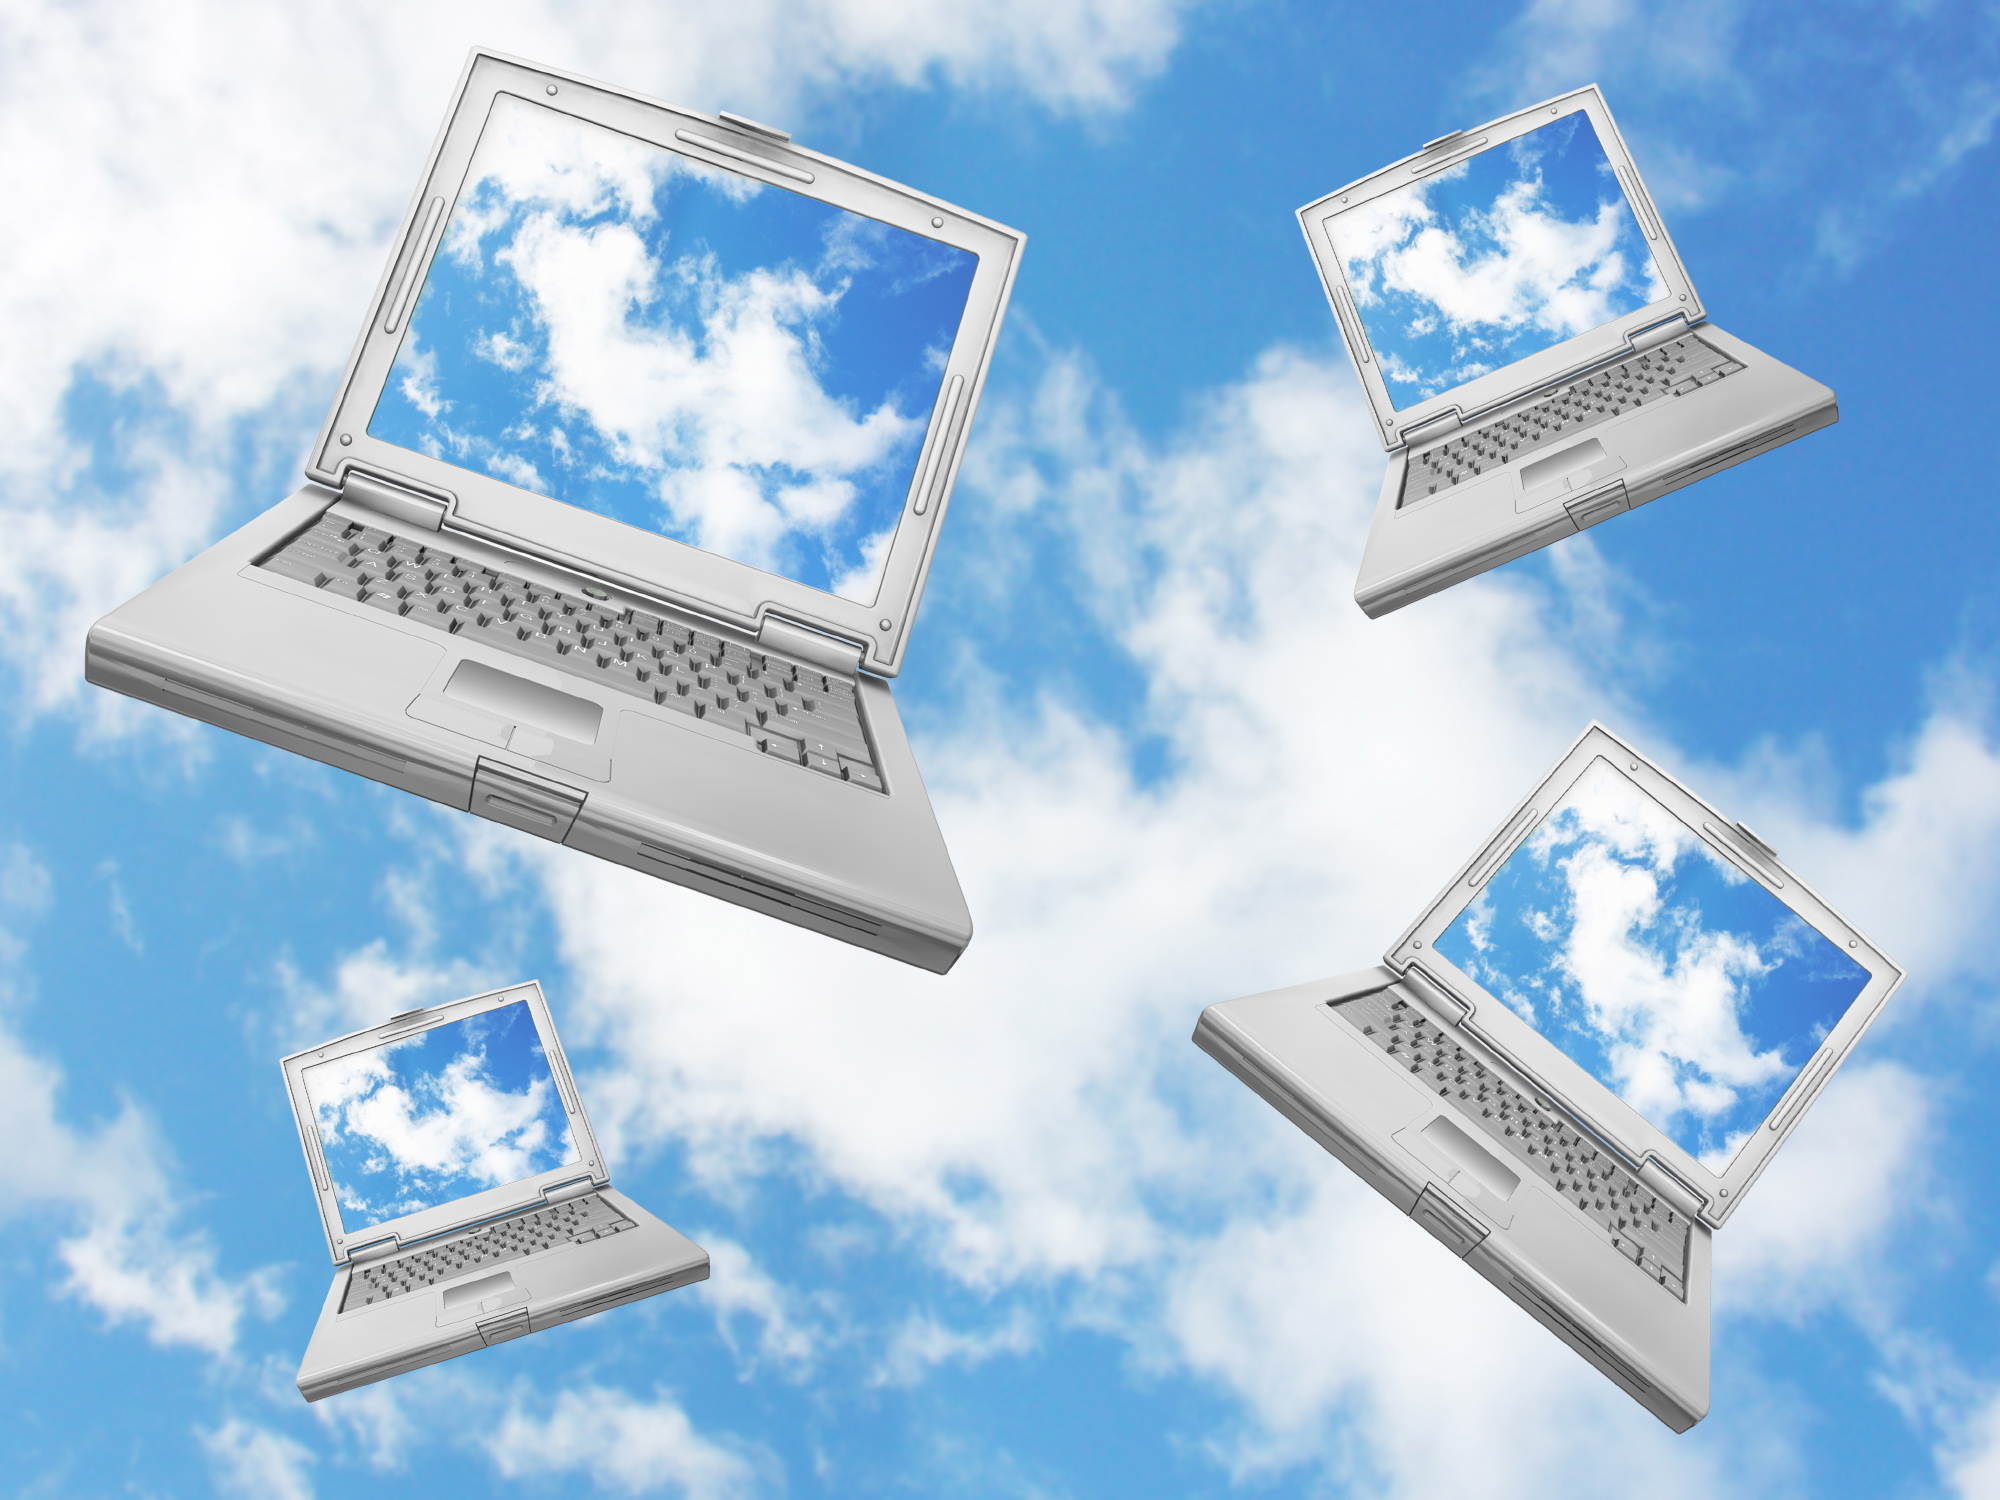 Falling laptops